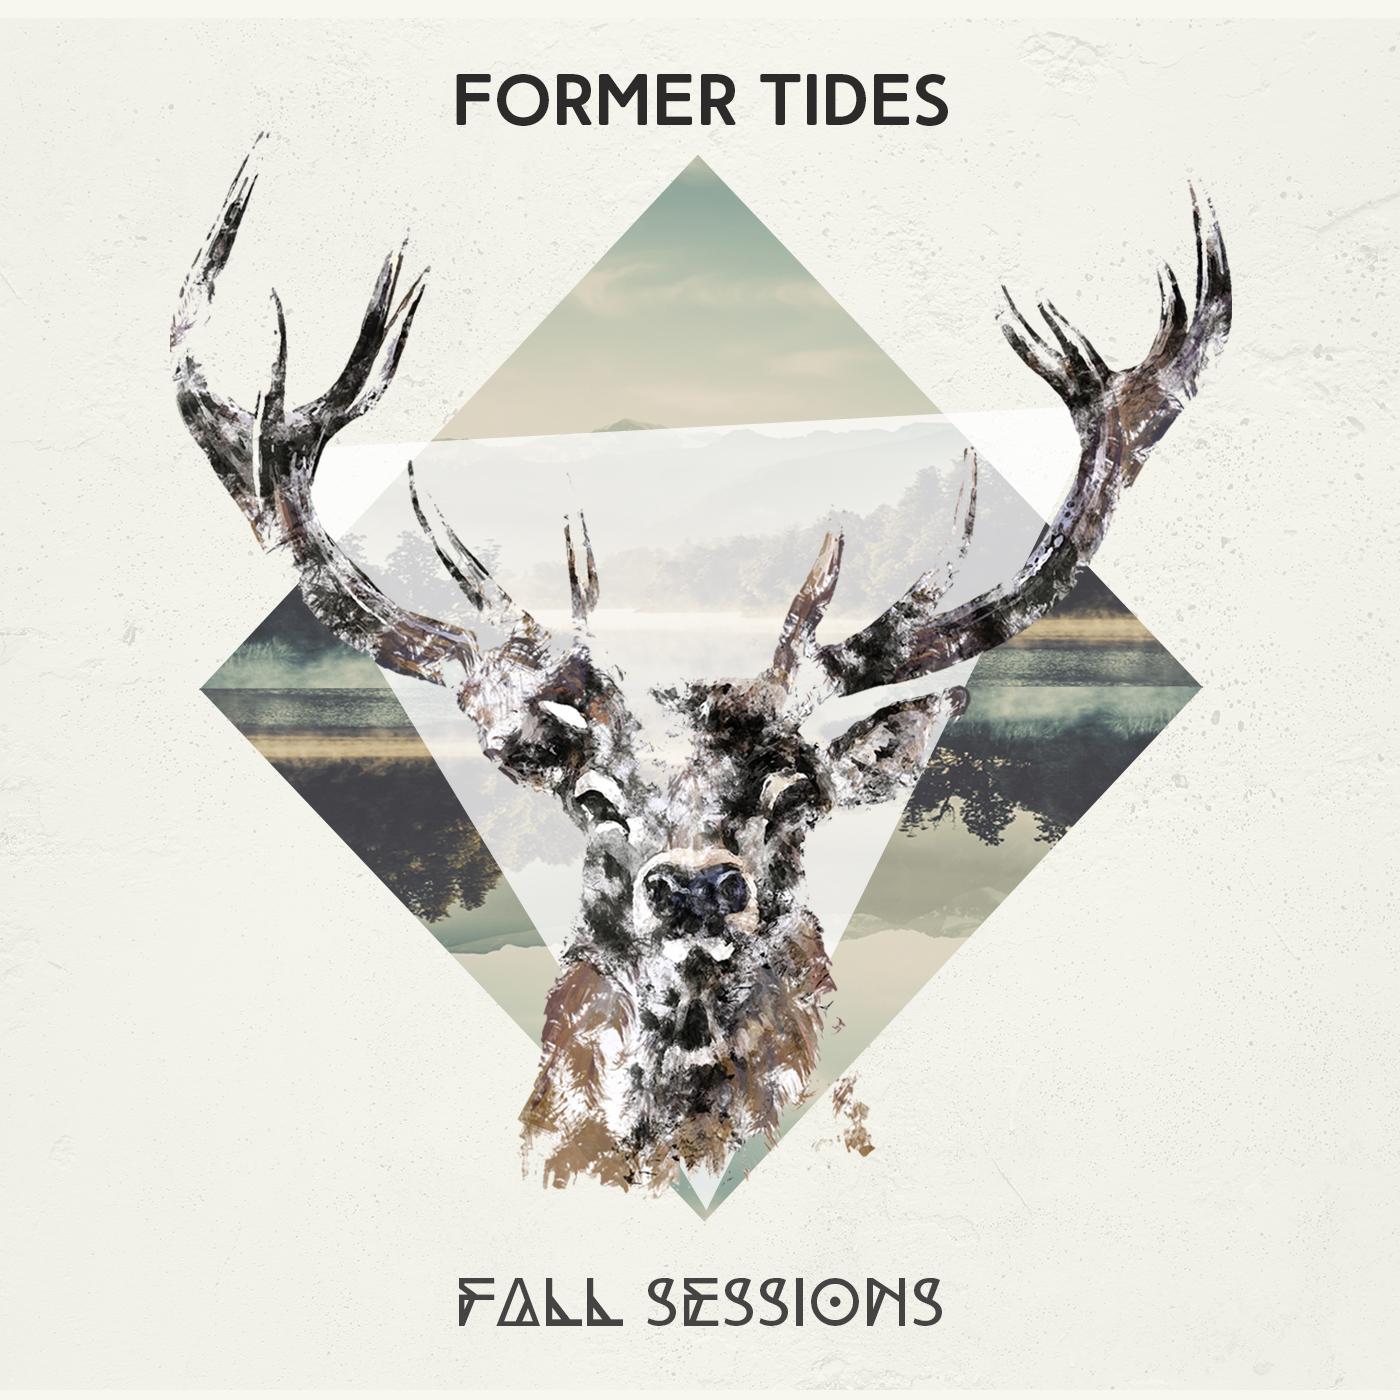 FT+fall+sessions+digital+cover.jpg